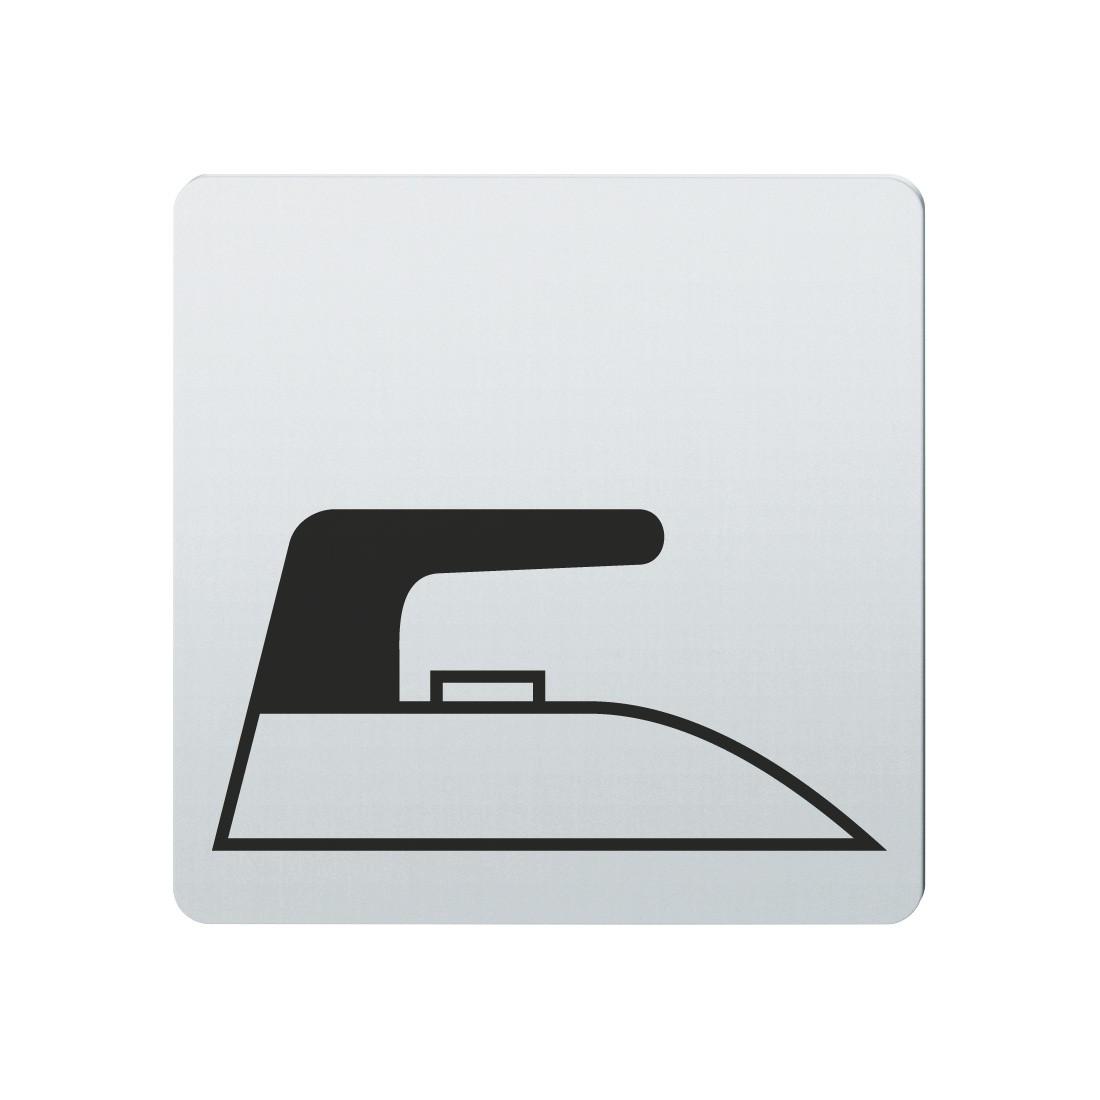 FSB Hinweiszeichen Buegelraum Lasergraviert Edelstahl fein matt (0 36 4059 00141 6204)